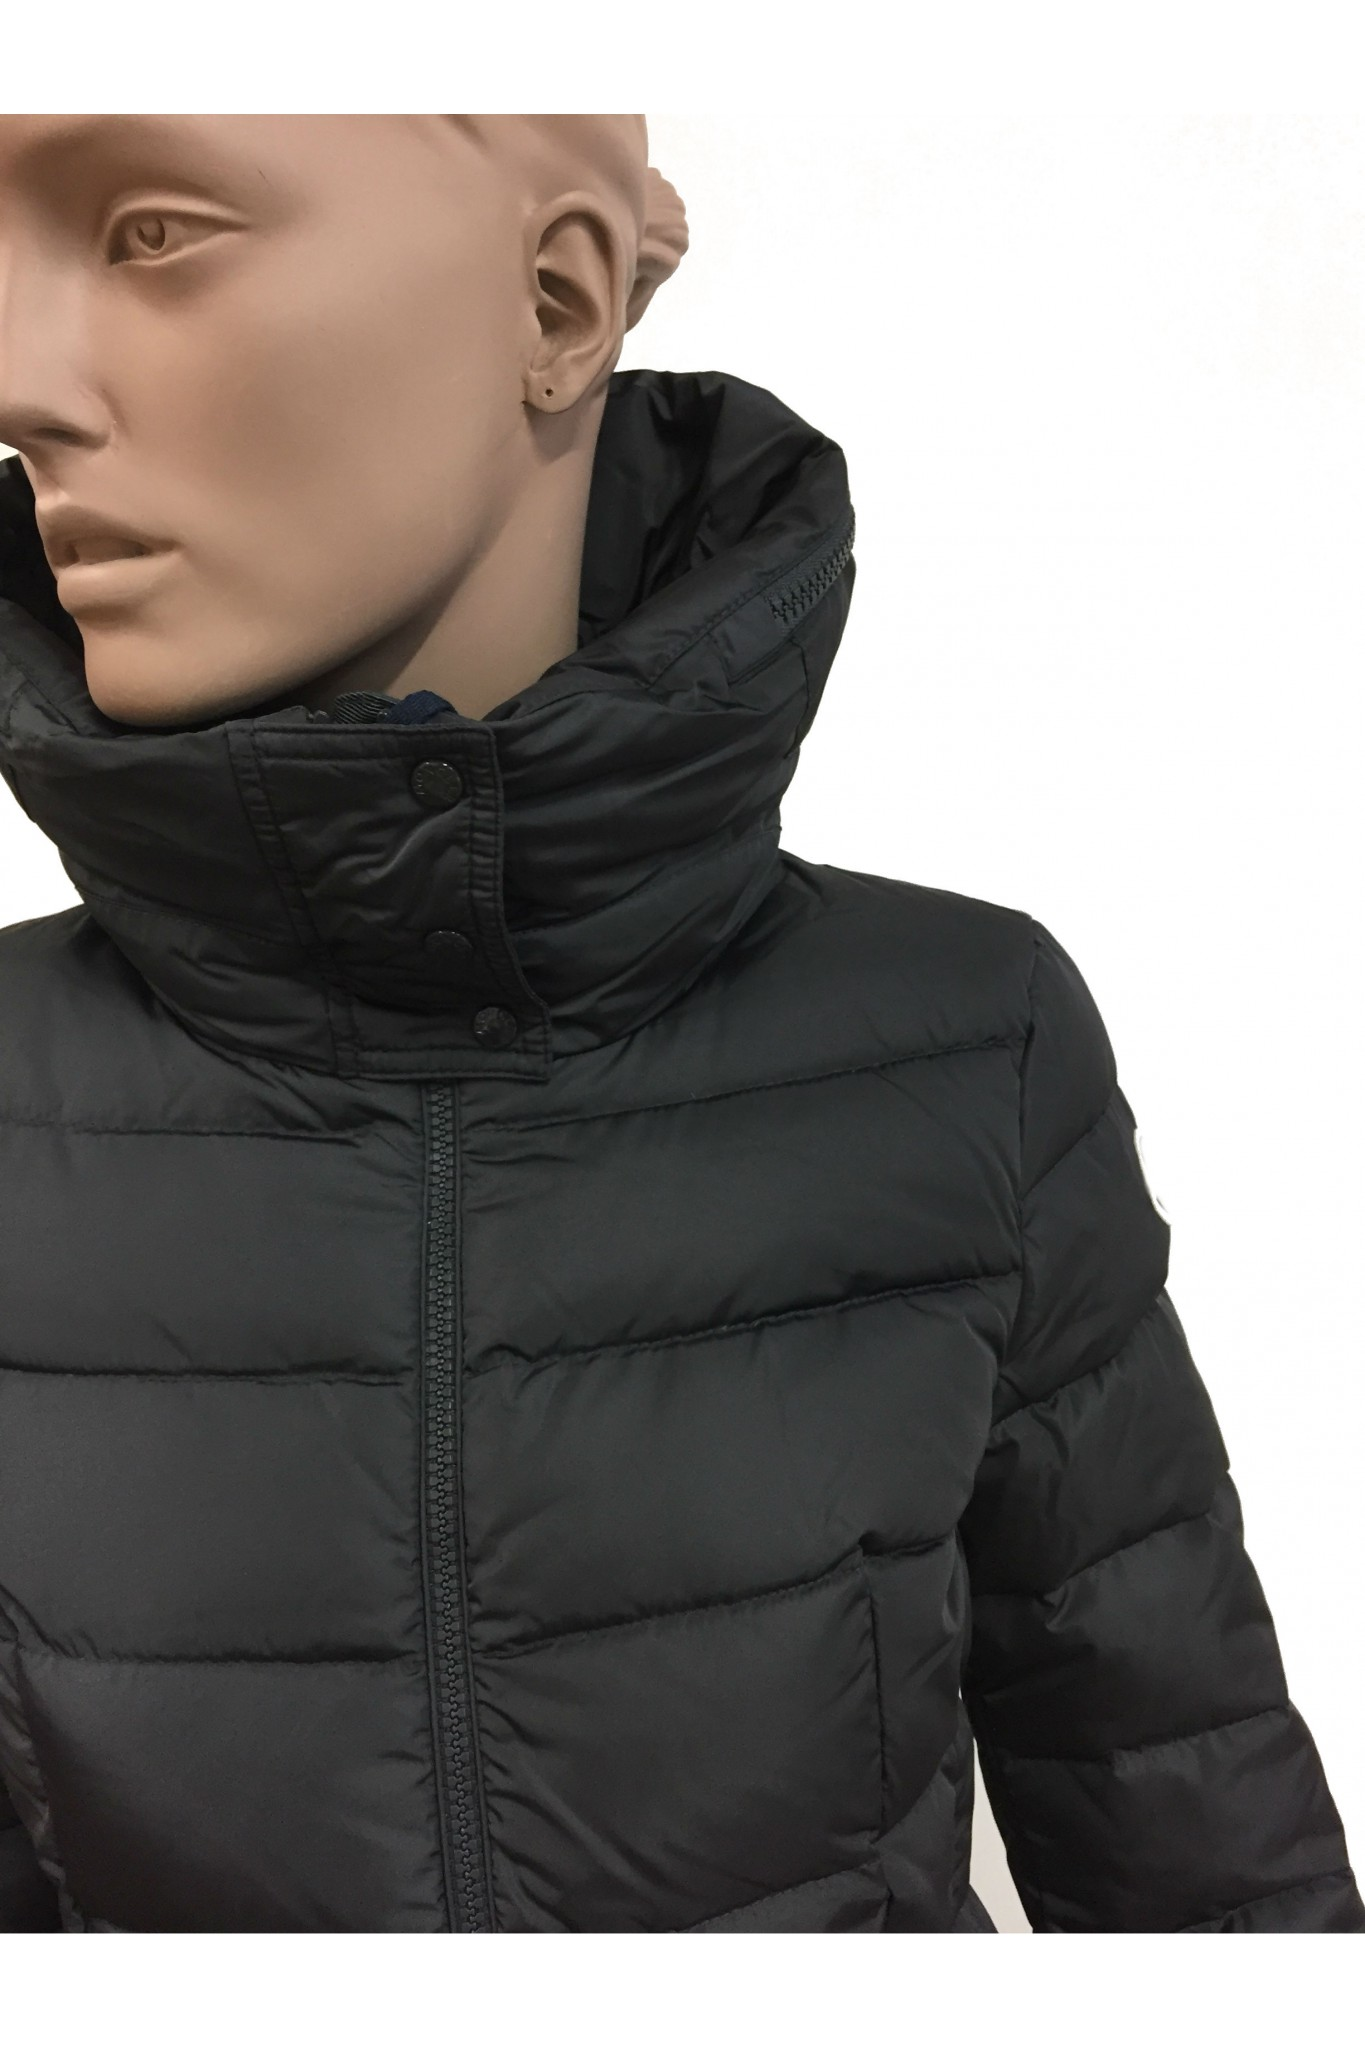 Moncler grey down jacket Flammette. Previous. Next